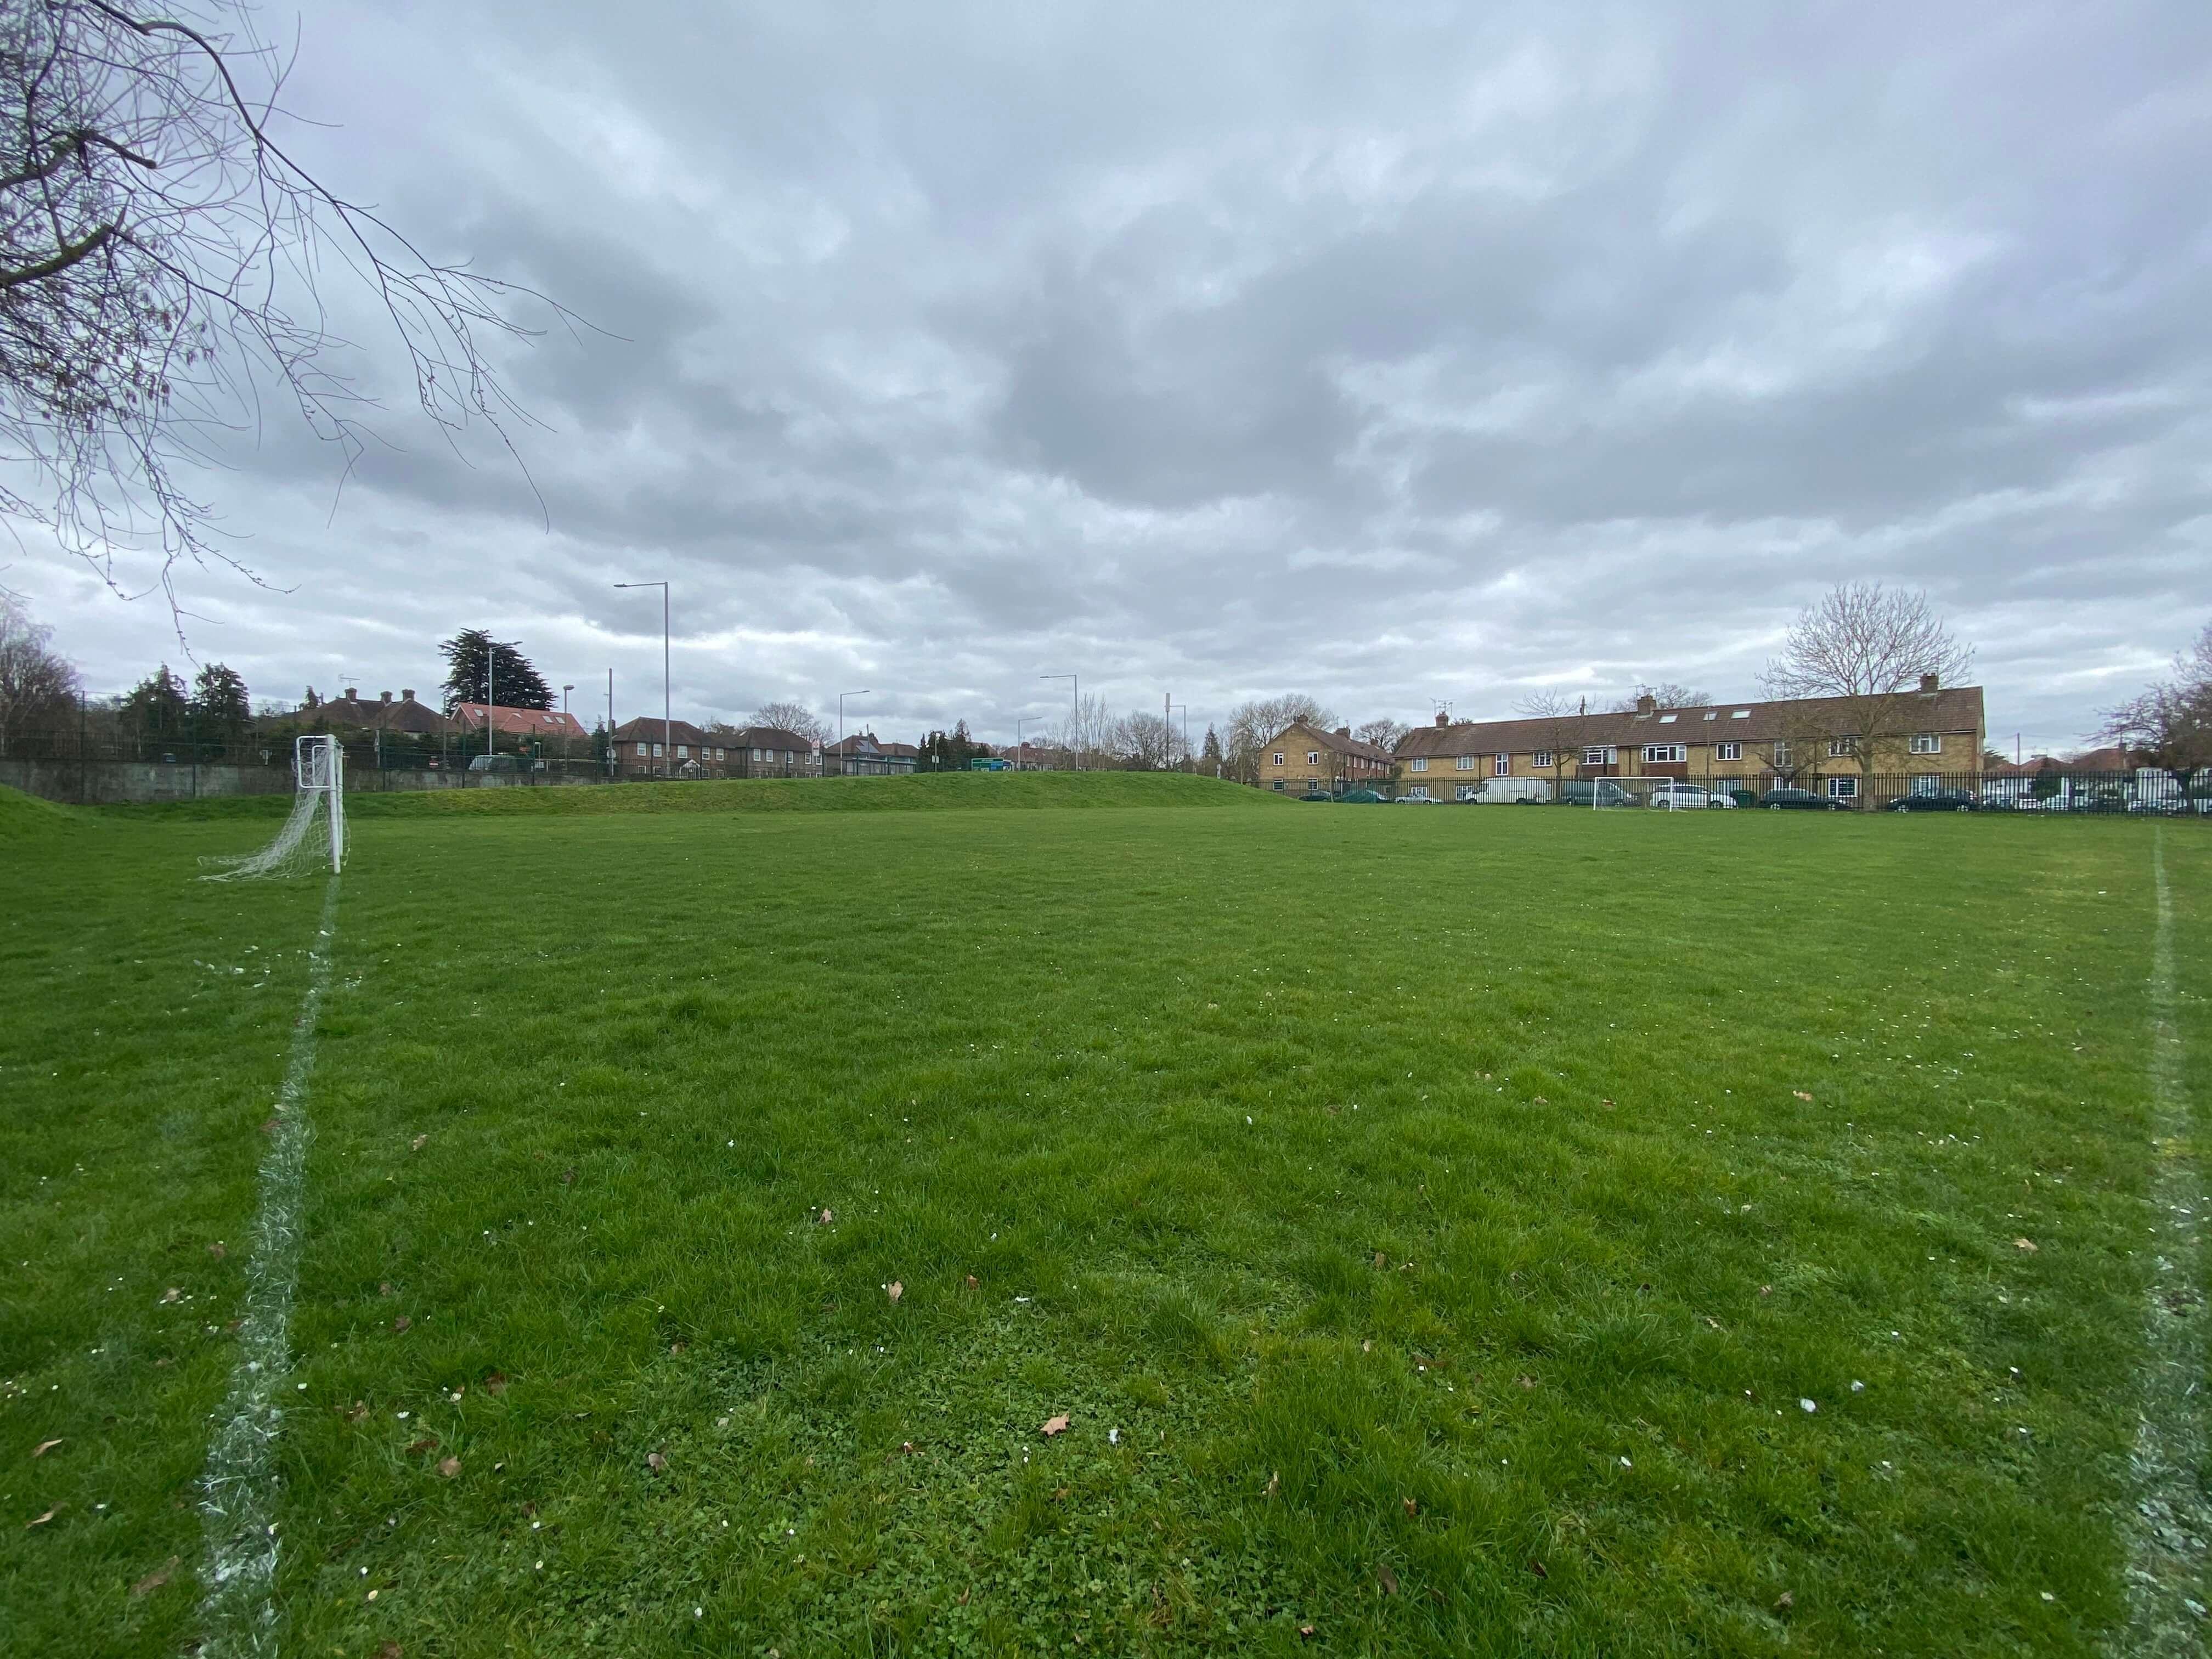 Fairway School Football Pitch